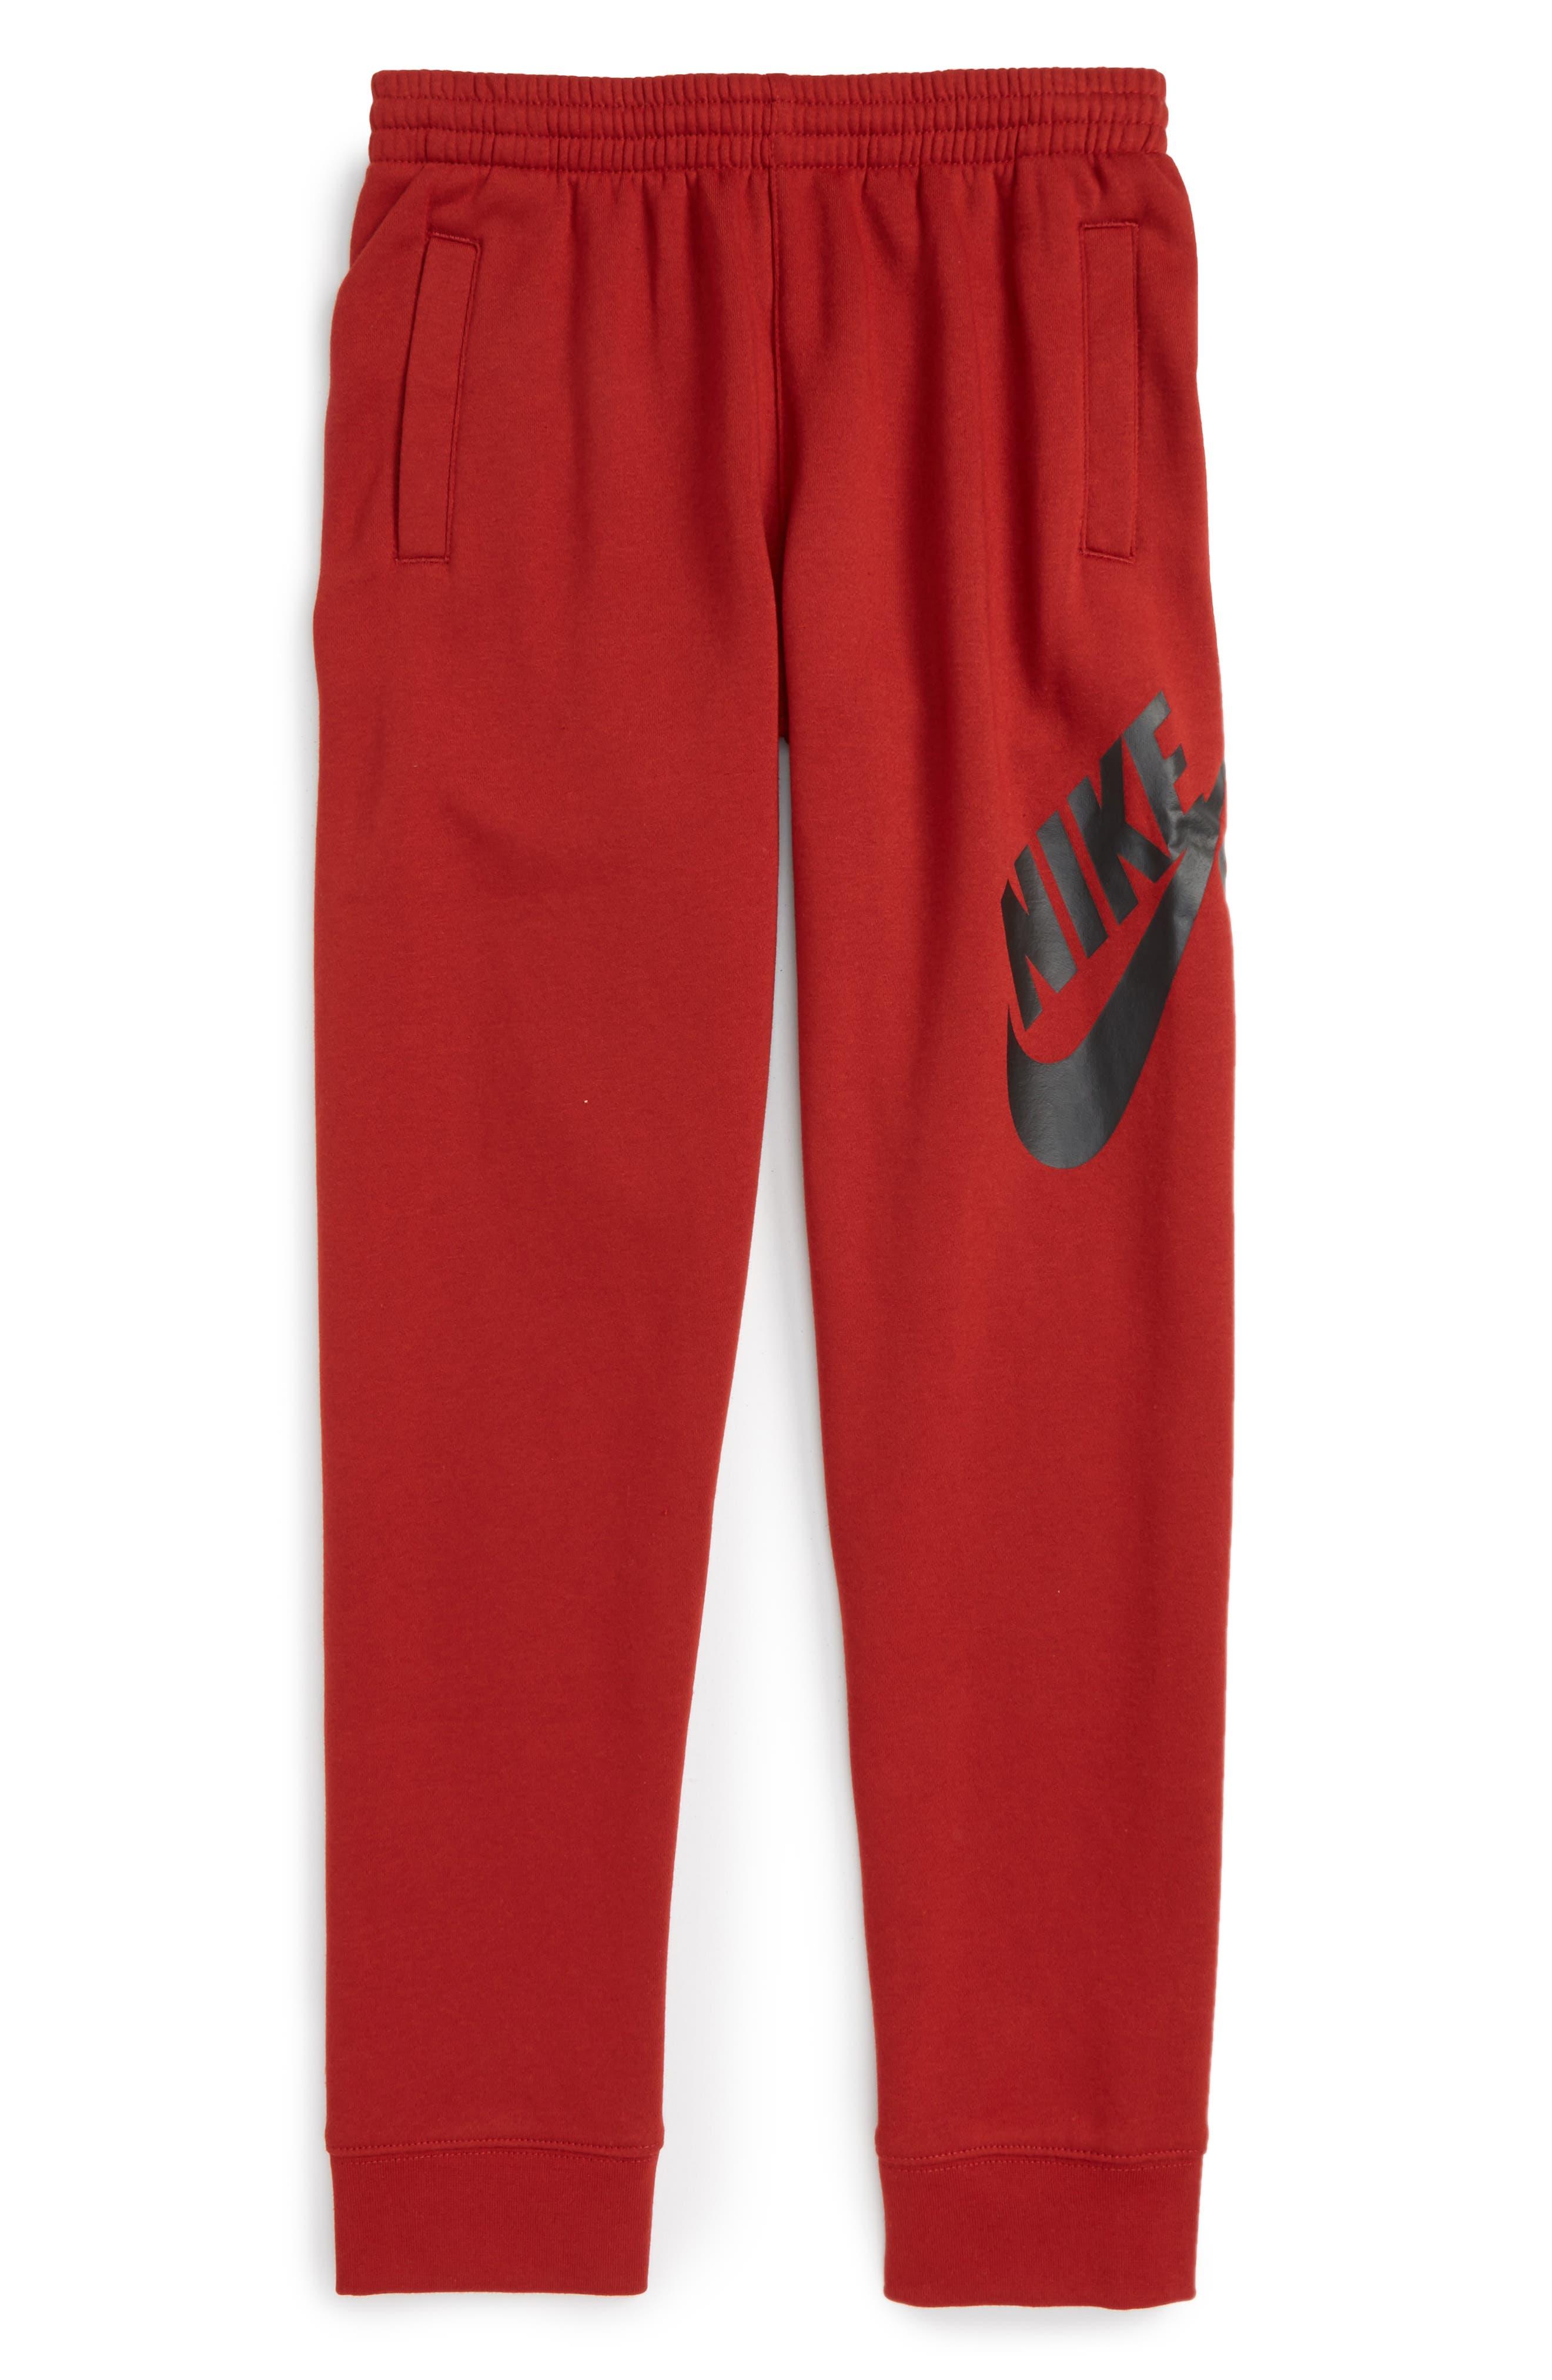 Alternate Image 1 Selected - Nike 'SB Everett' French Terry Sweatpants (Big Boys)